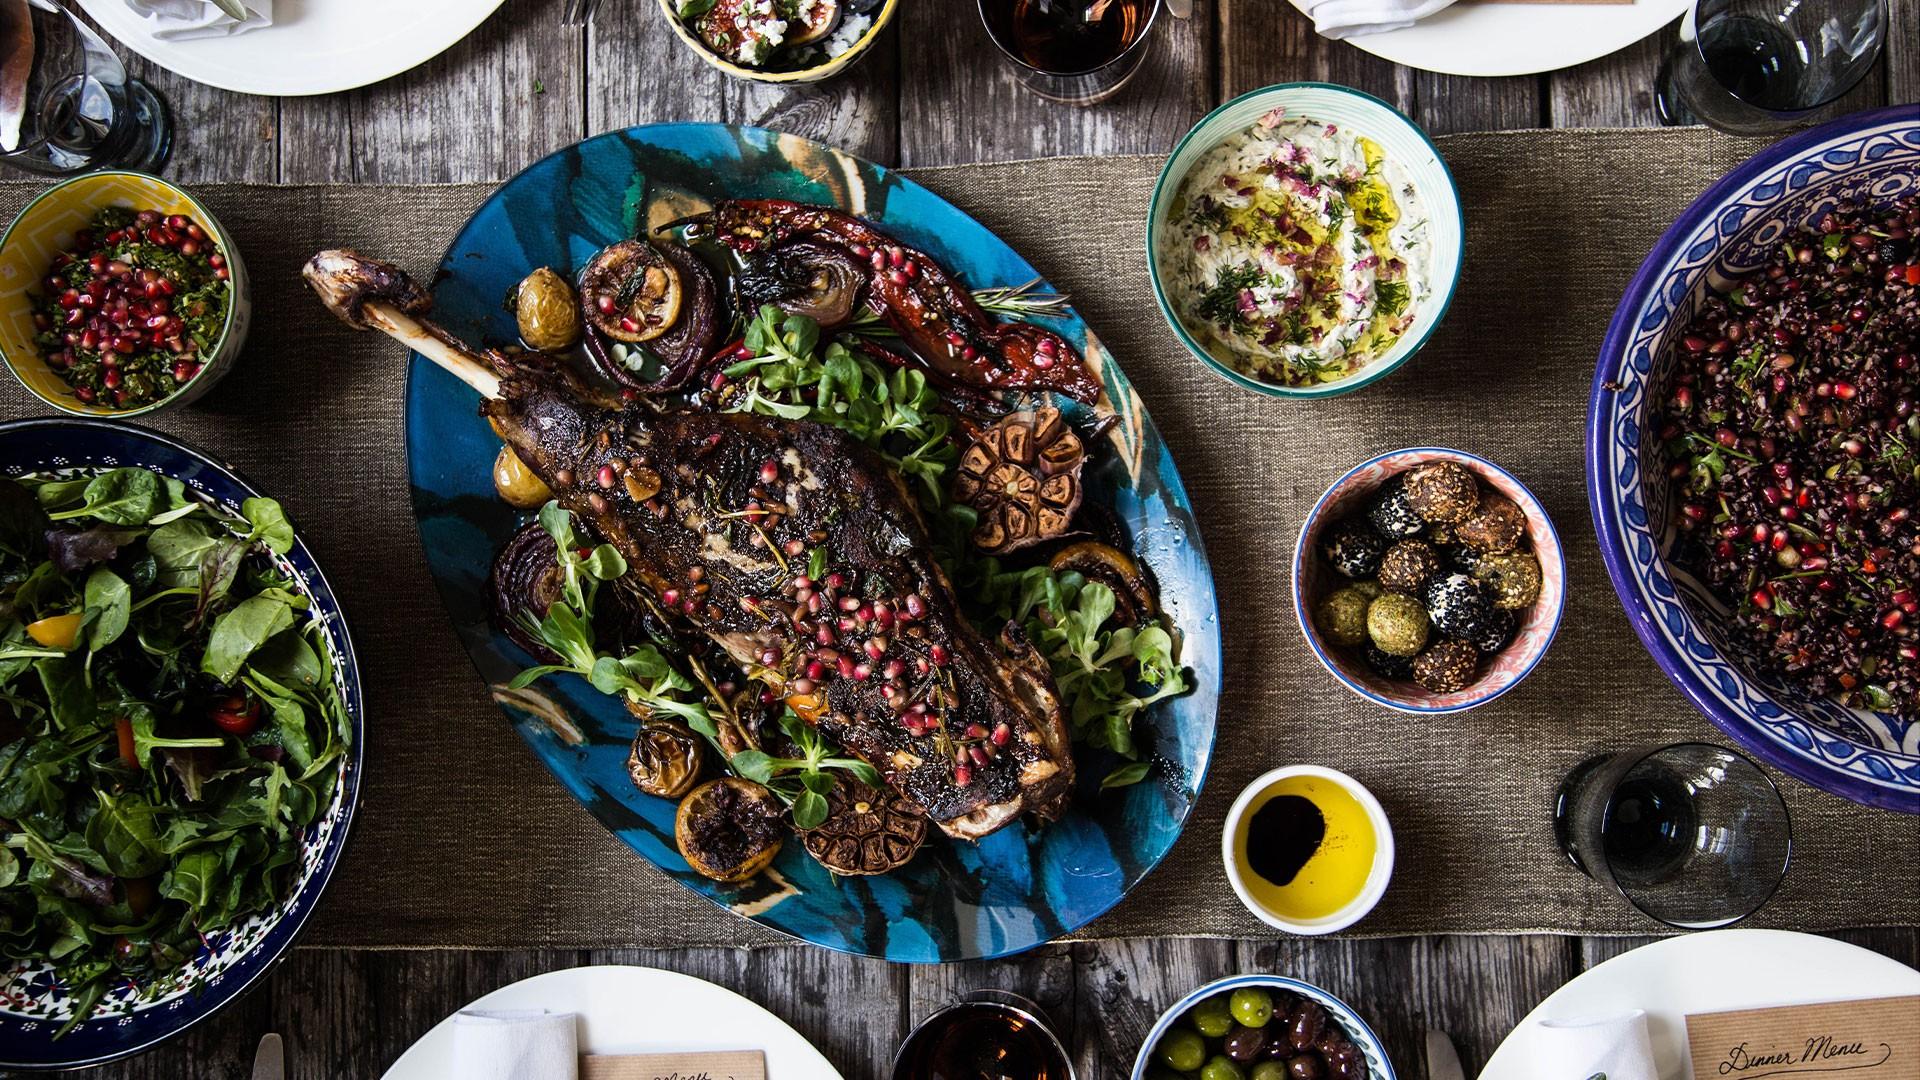 Saima Khan's colourful cooking